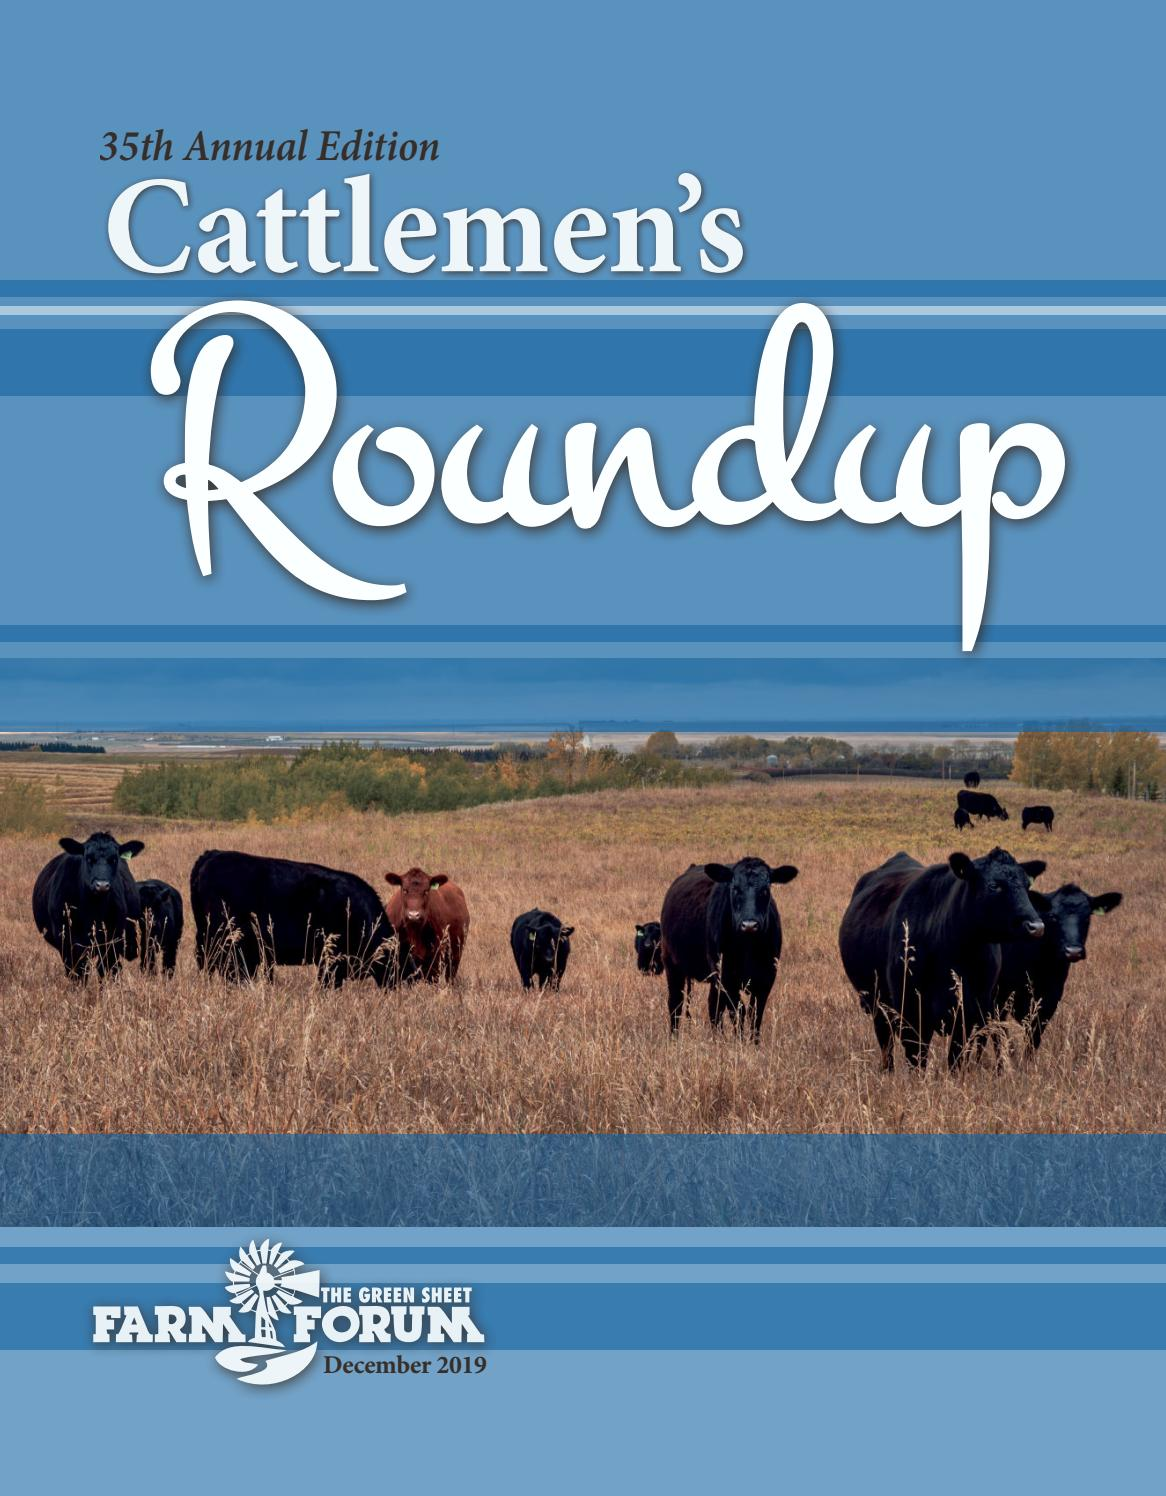 2019 Farm Forum Cattlemen S Roundup By Aberdeen News Farm Forum Issuu The express, lock haven, pa. 2019 farm forum cattlemen s roundup by